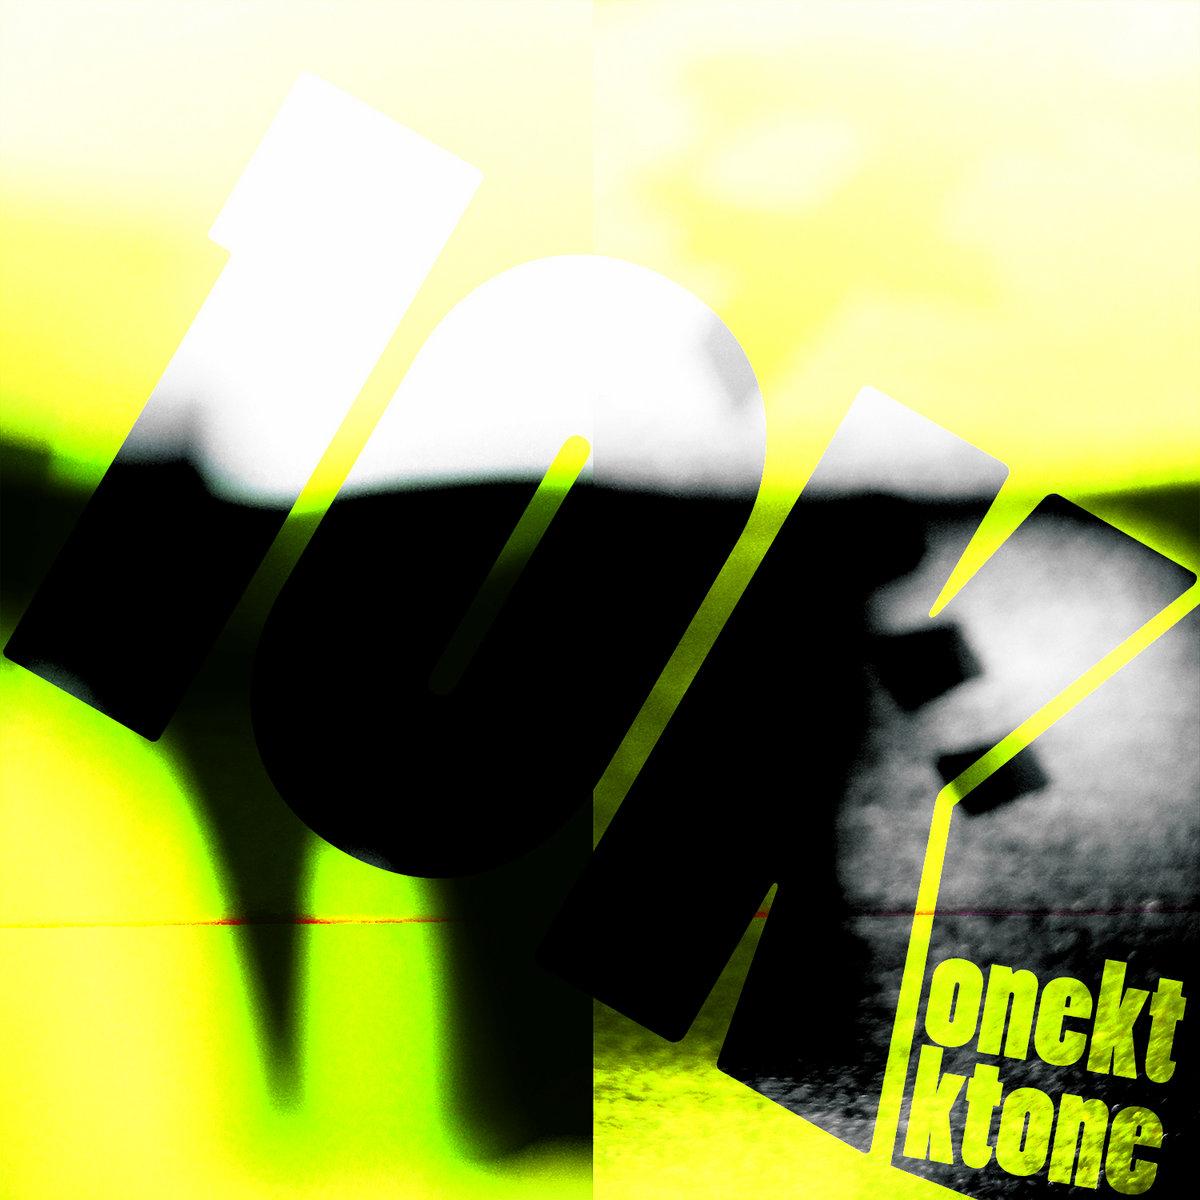 10konekt – Ktone